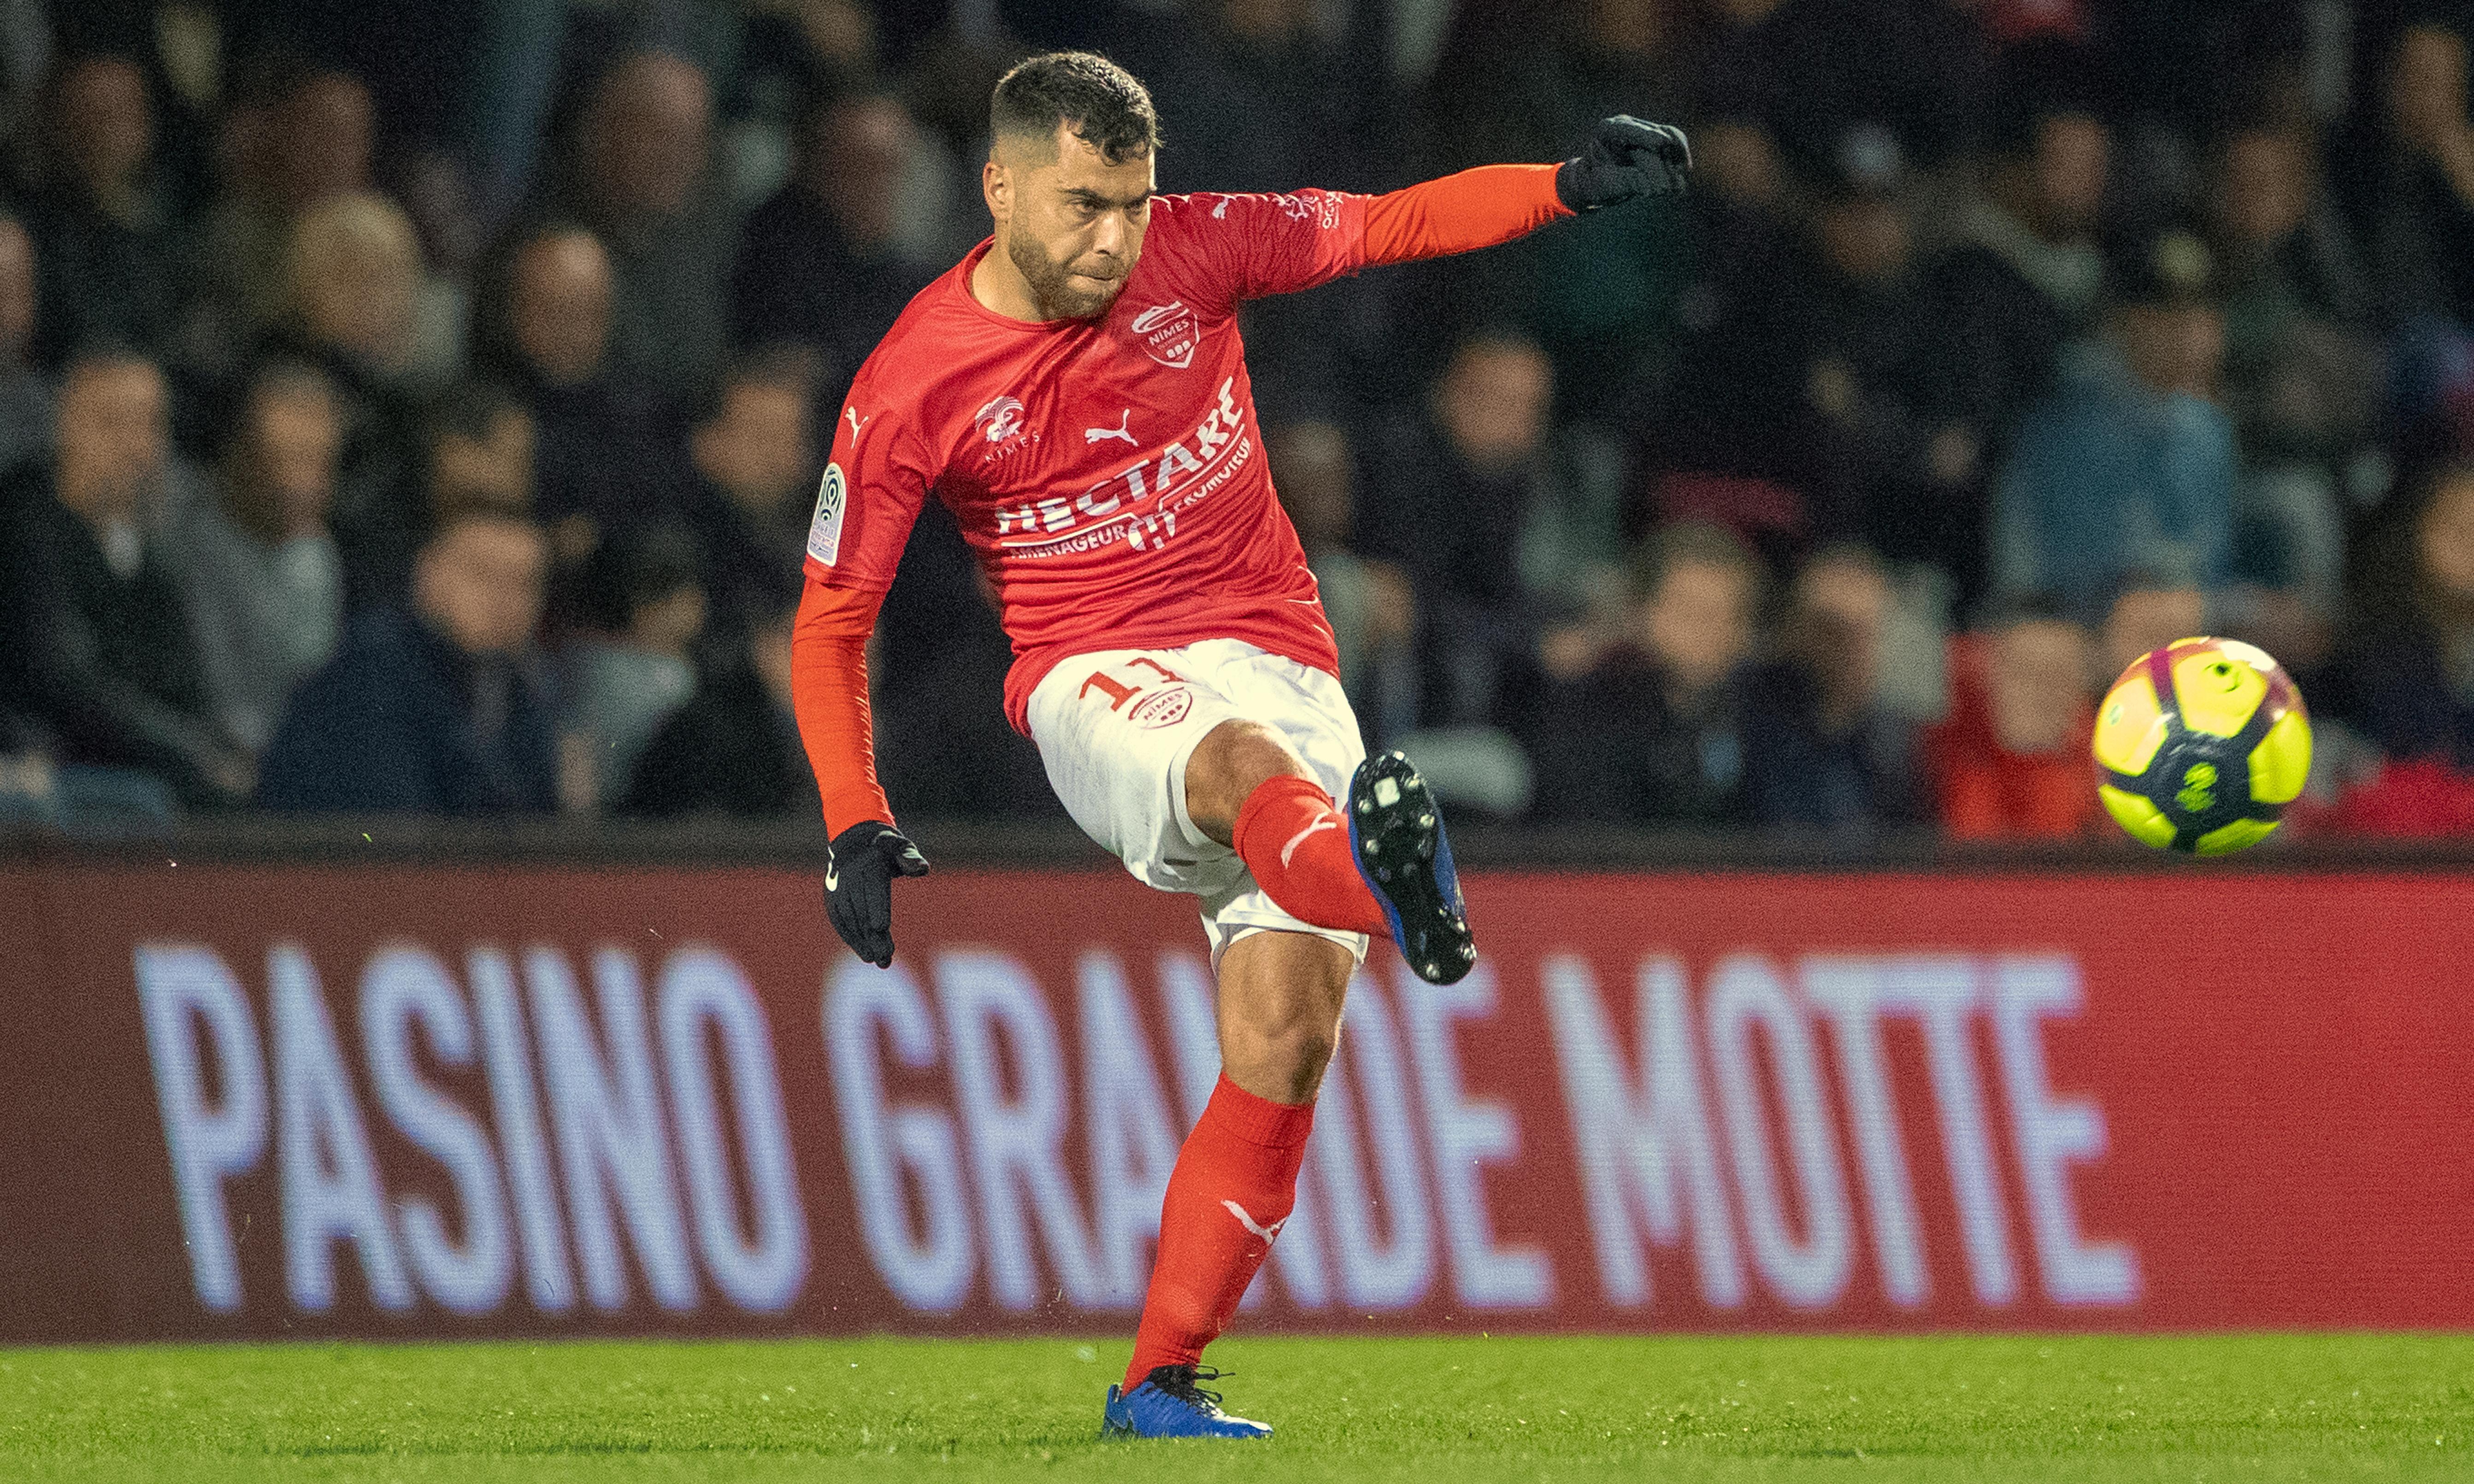 Téji Savanier was in Ligue 2 last year. Now he is dominating Ligue 1